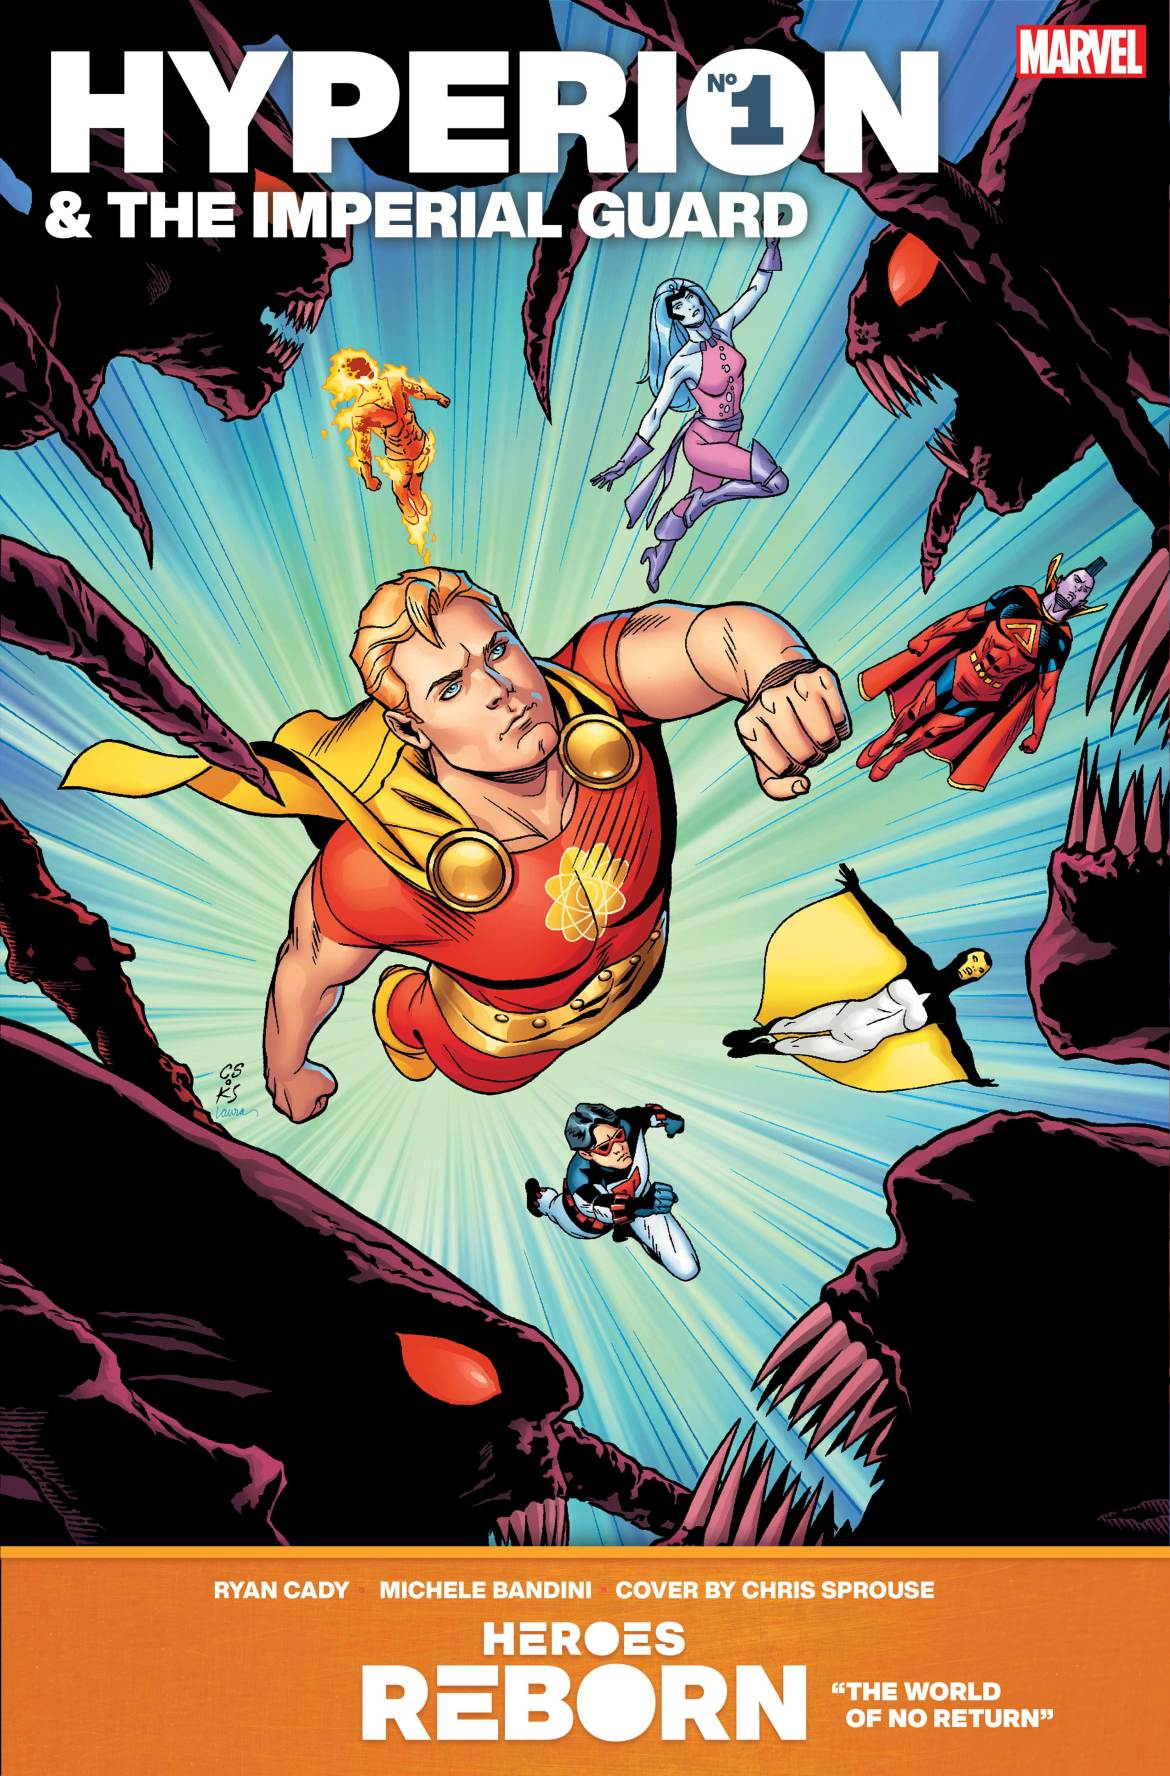 REBORN_HyperionImperialGuard-1 Marvel Comics May 2021 Solicitations